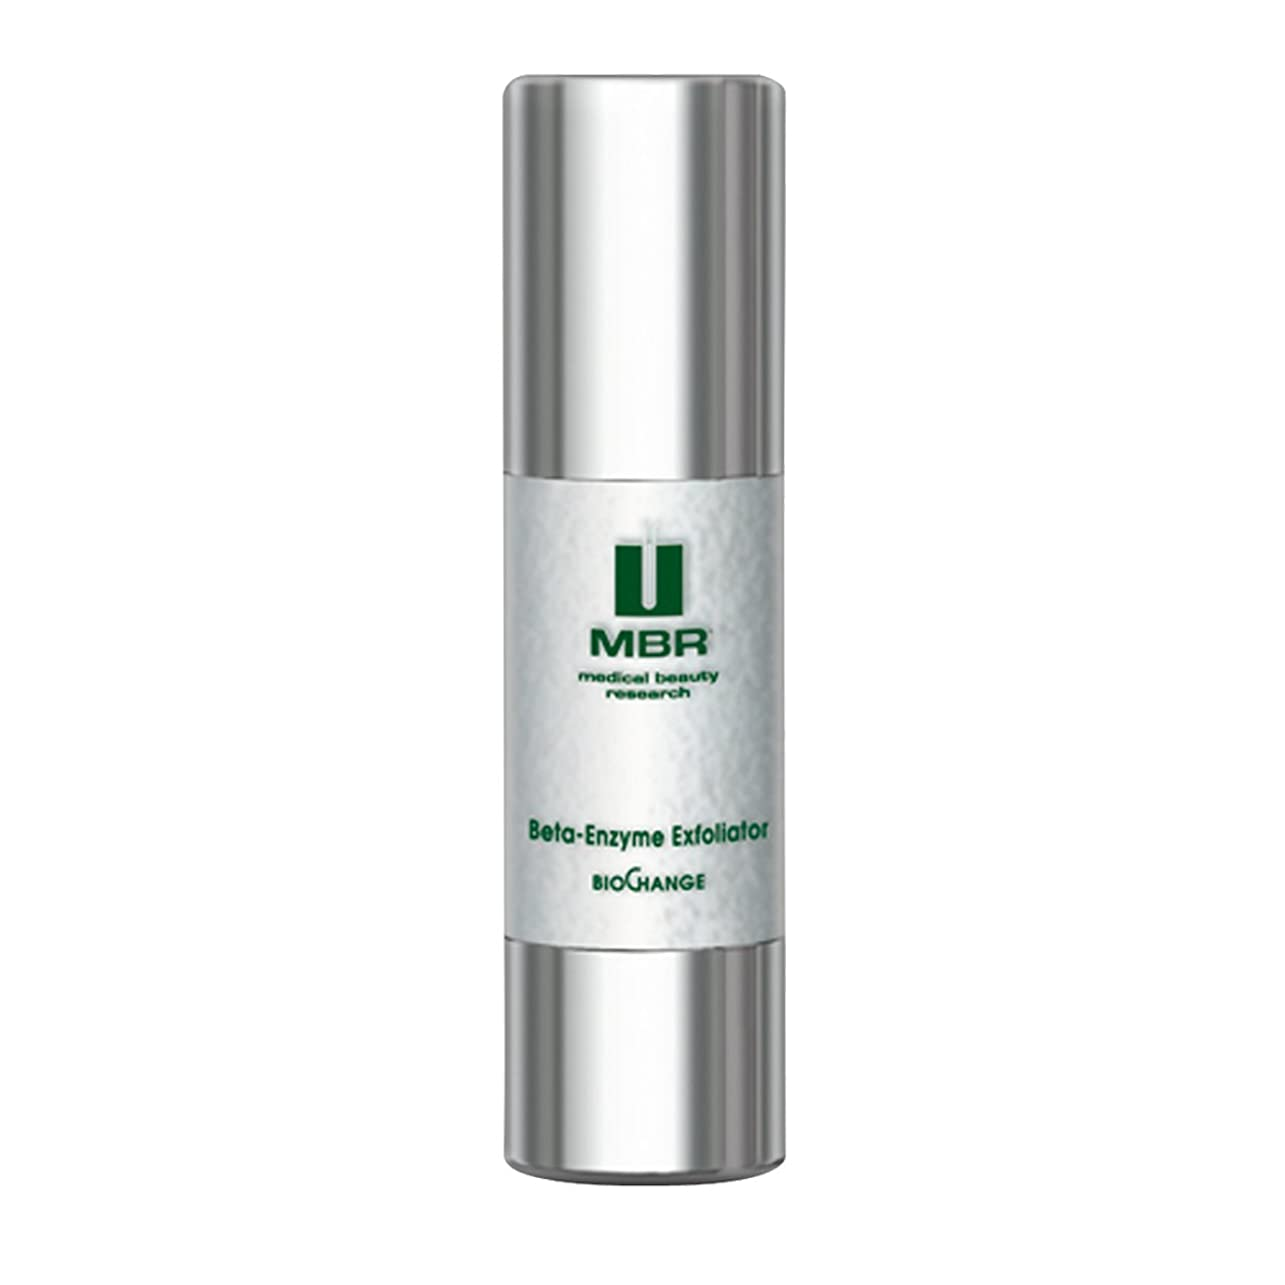 酸度靄十一MBR Medical Beauty Research BioChange Beta-Enzyme 30ml/1oz並行輸入品